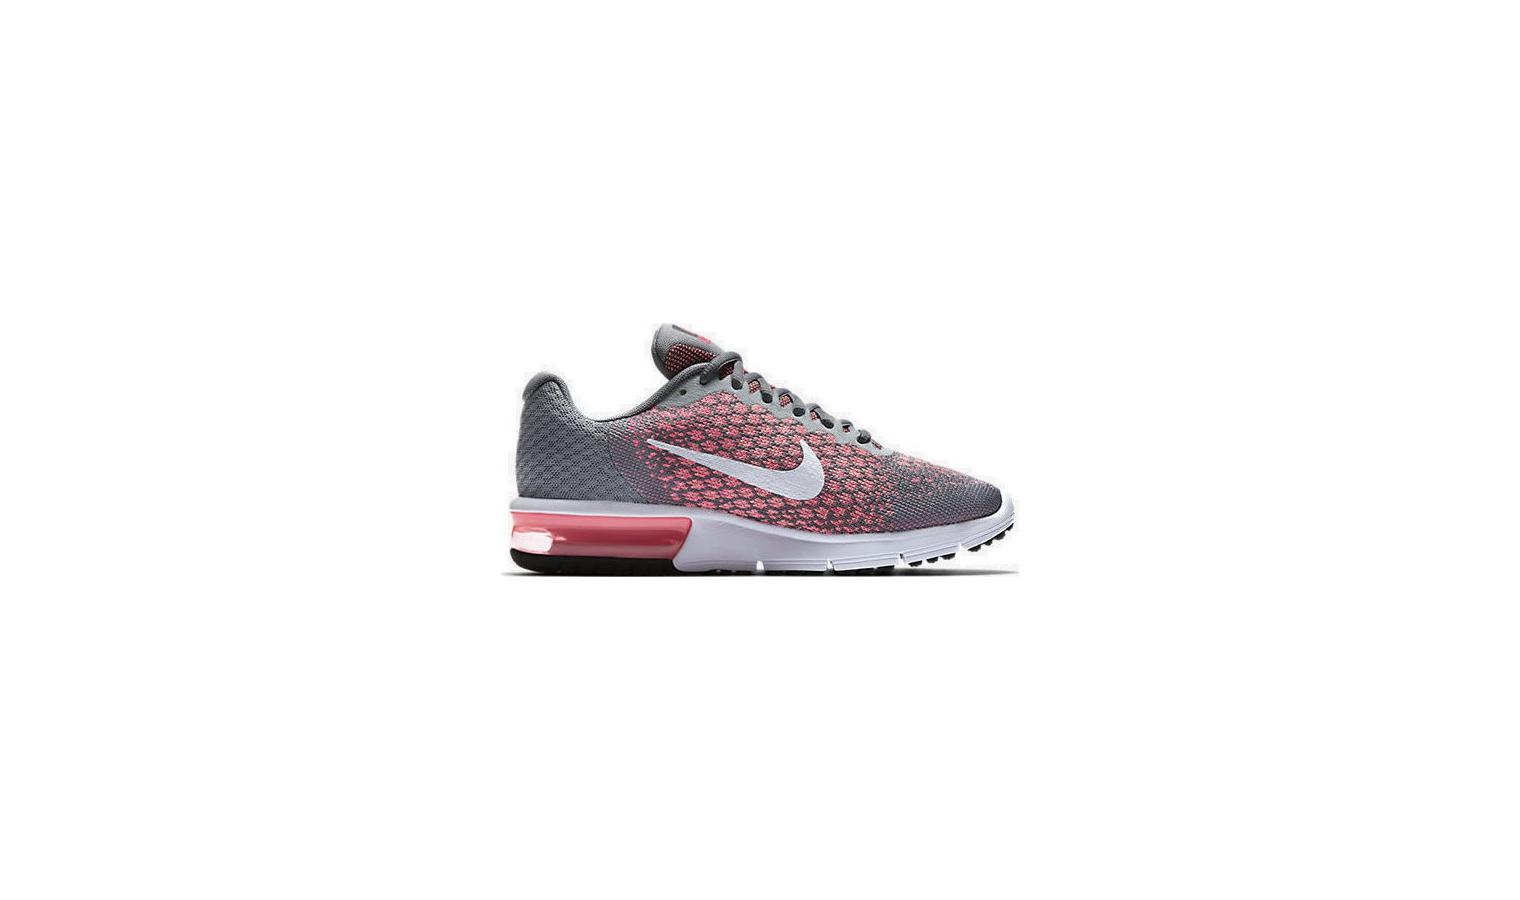 Dámské boty Nike AIR MAX SEQUENT 2 W šedo-růžové  7a4f97594fb